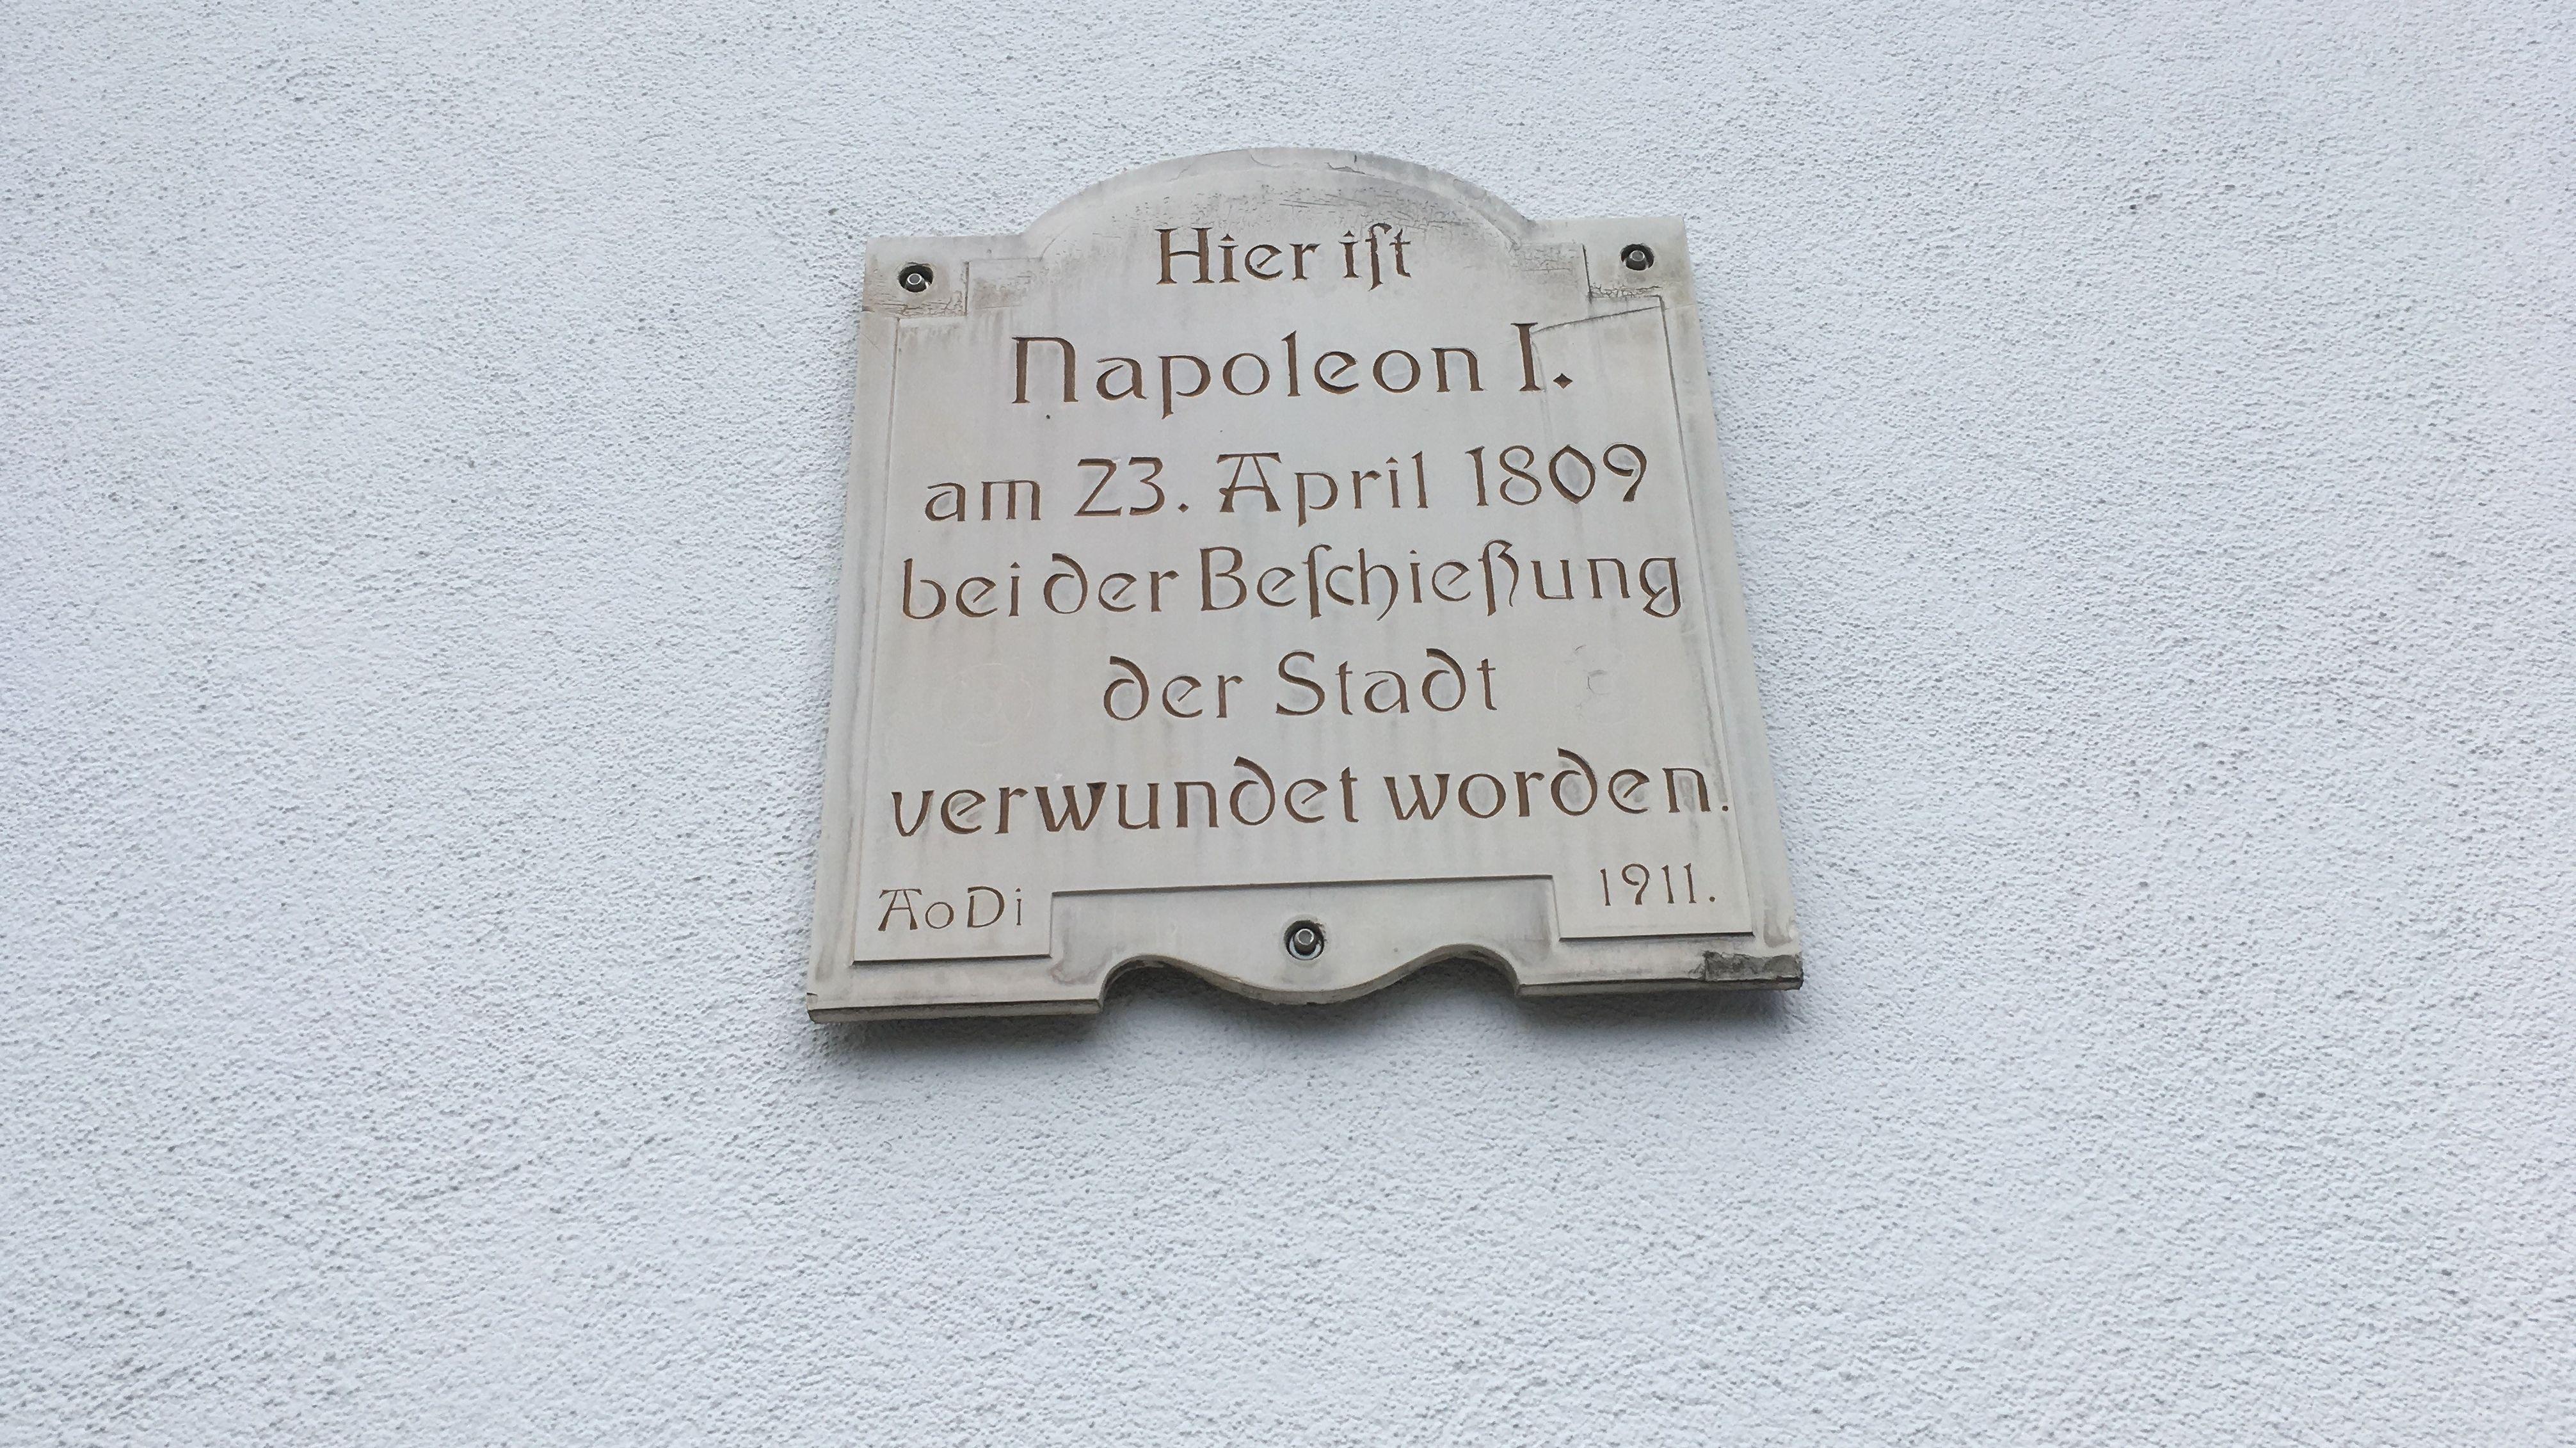 Gedenktafel zur Verwundung Napoleons